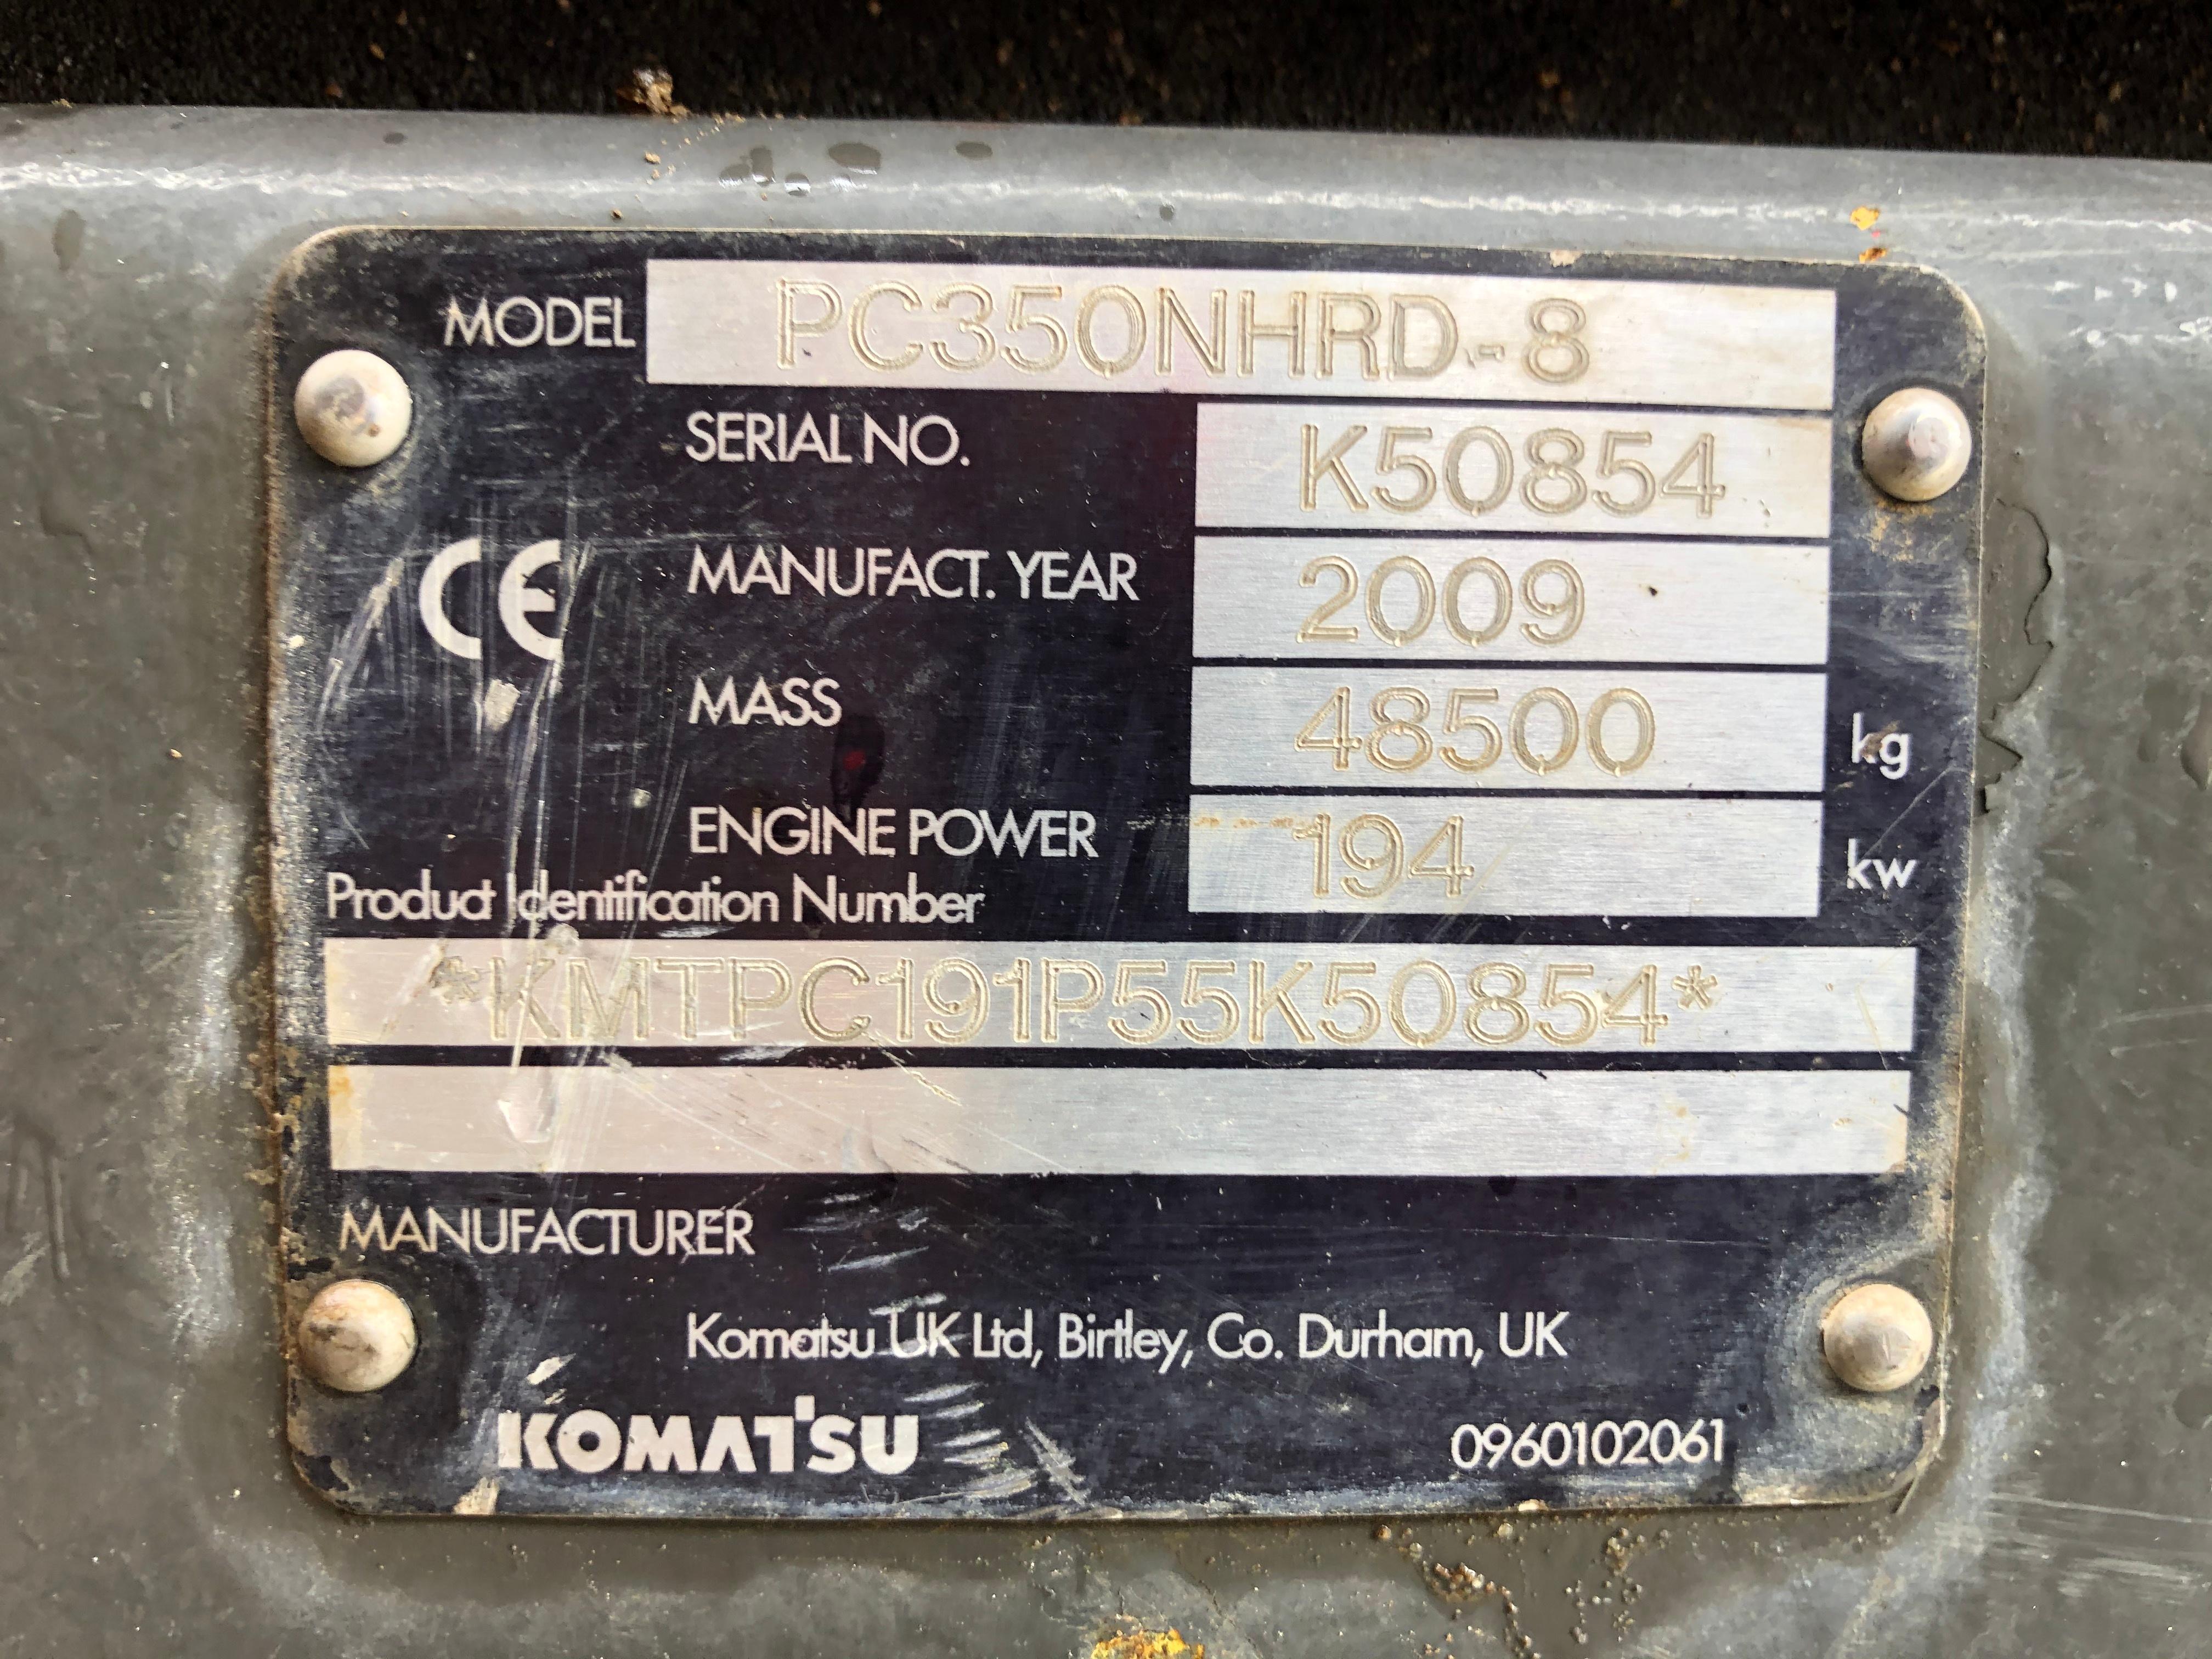 Used 2009 Komatsu PC350 NHRD-8 For Sale